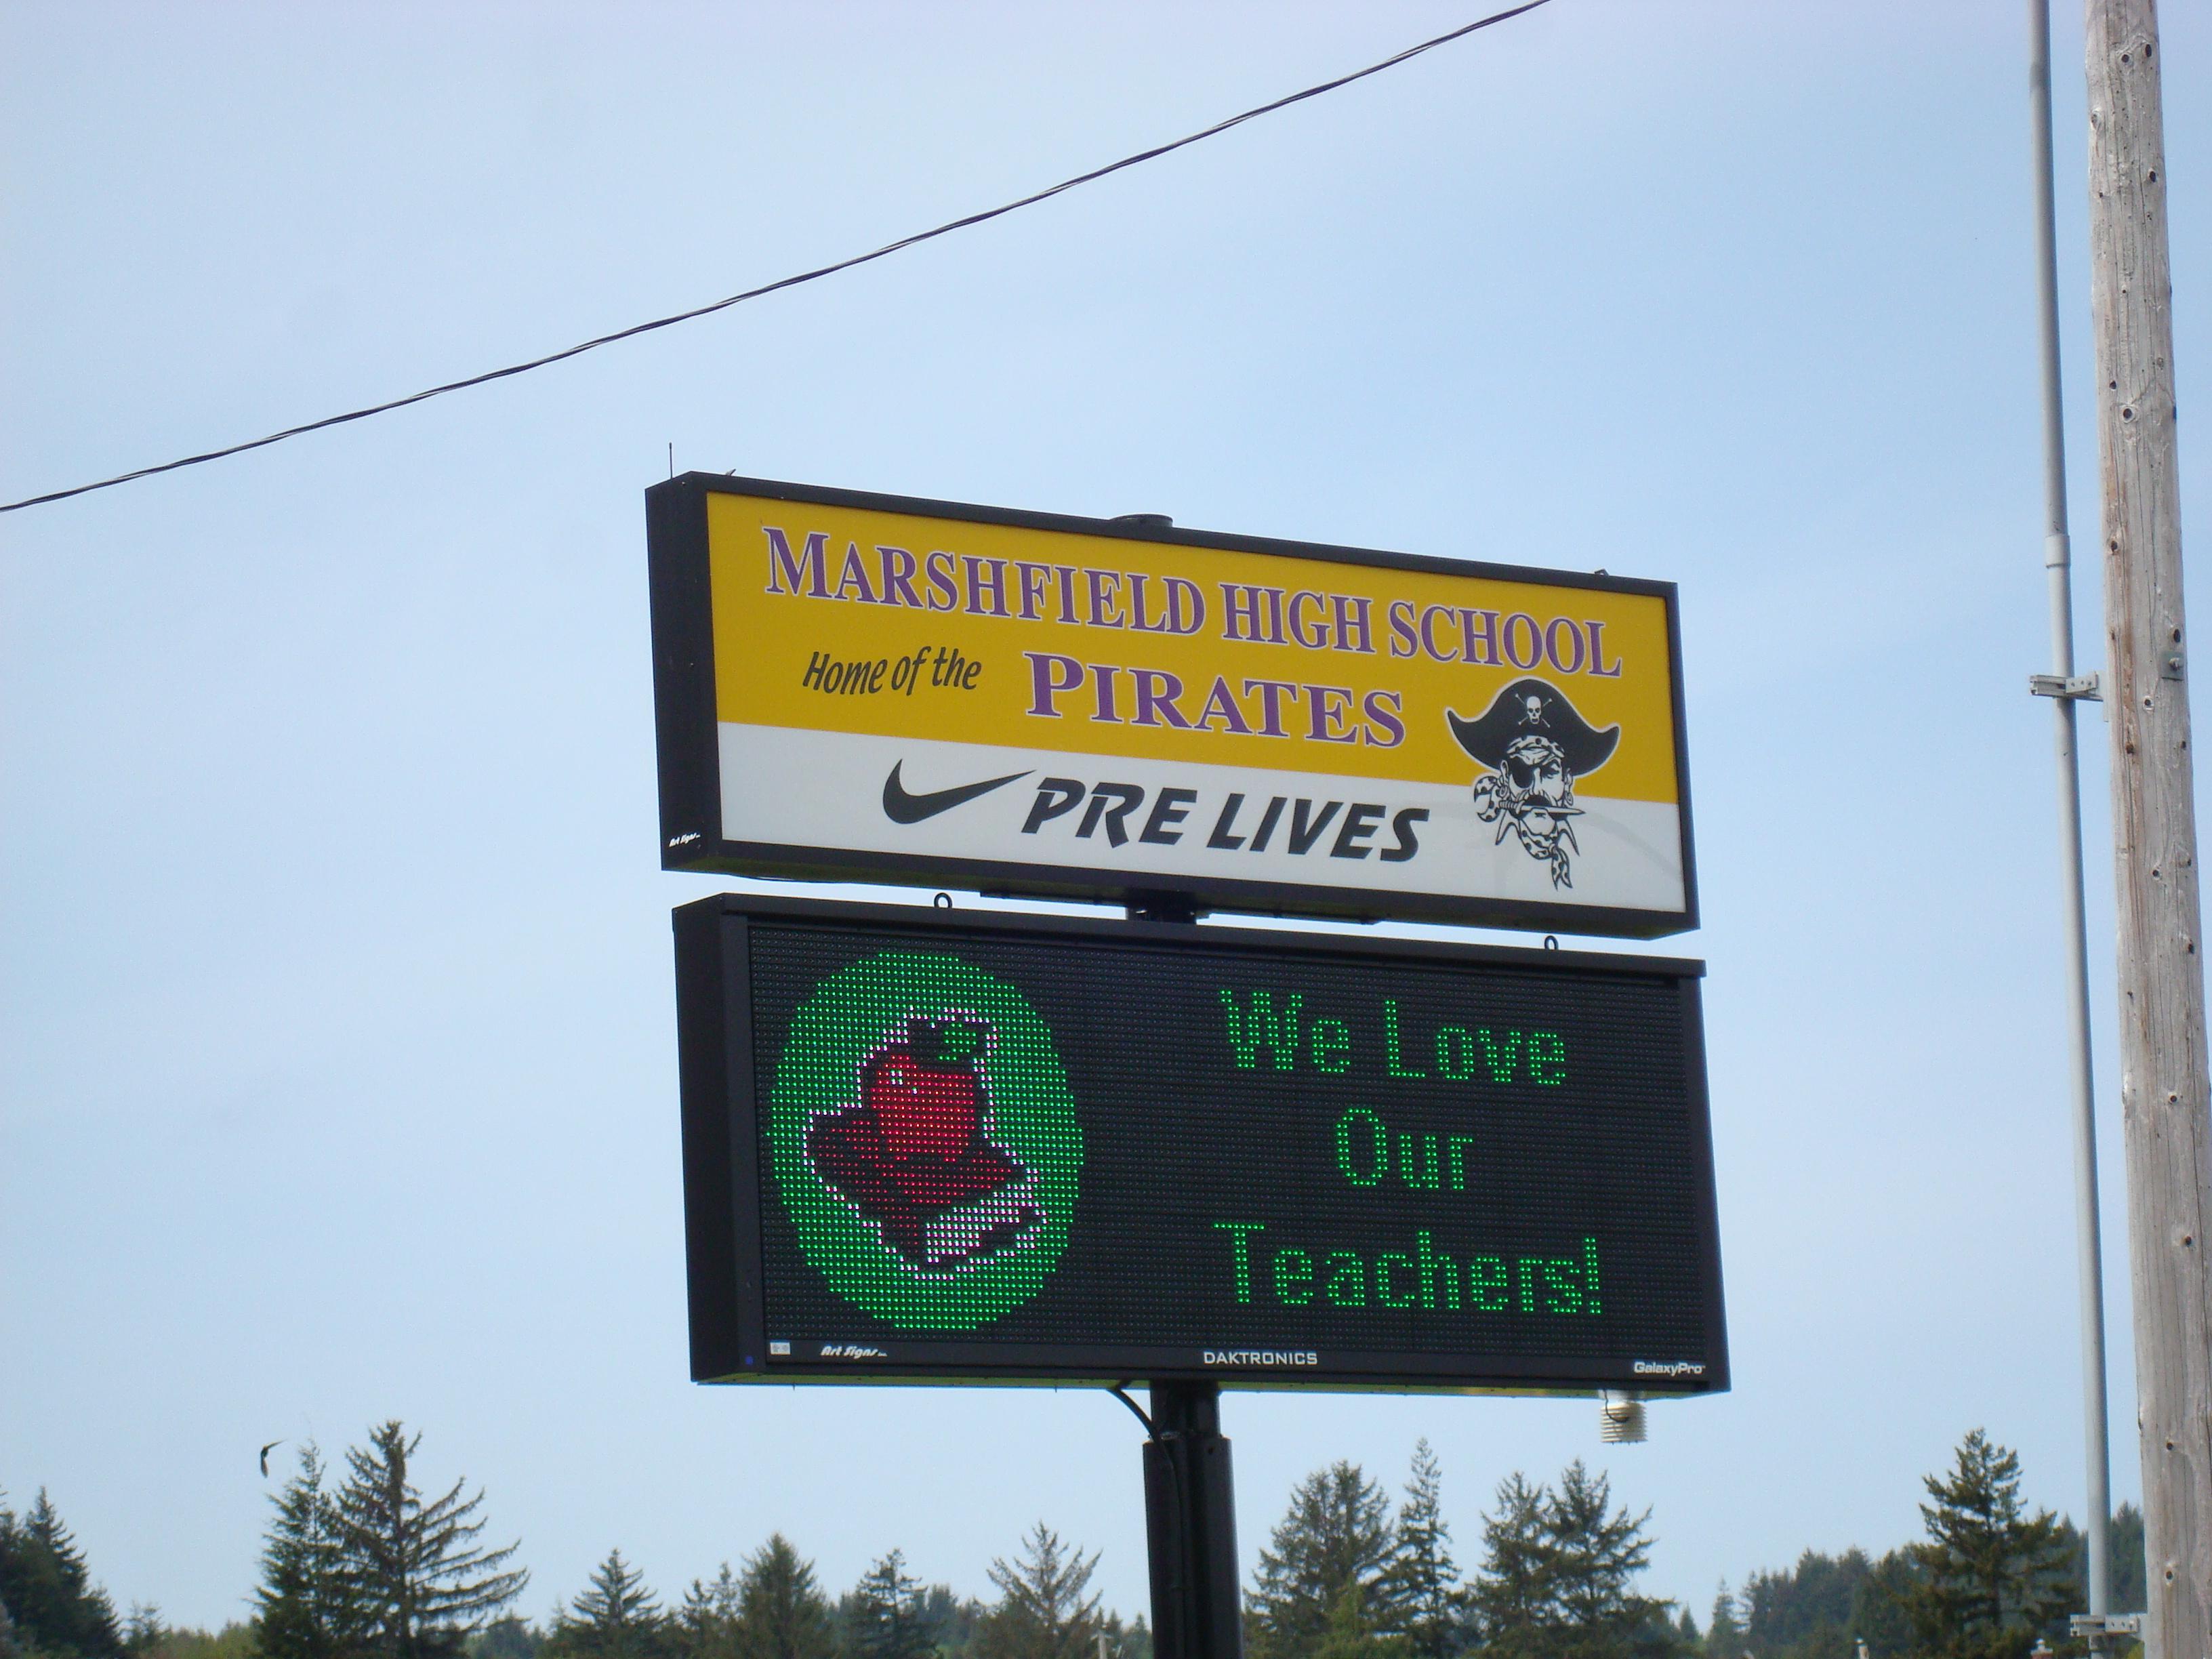 Marshfield HS - Pre Lives